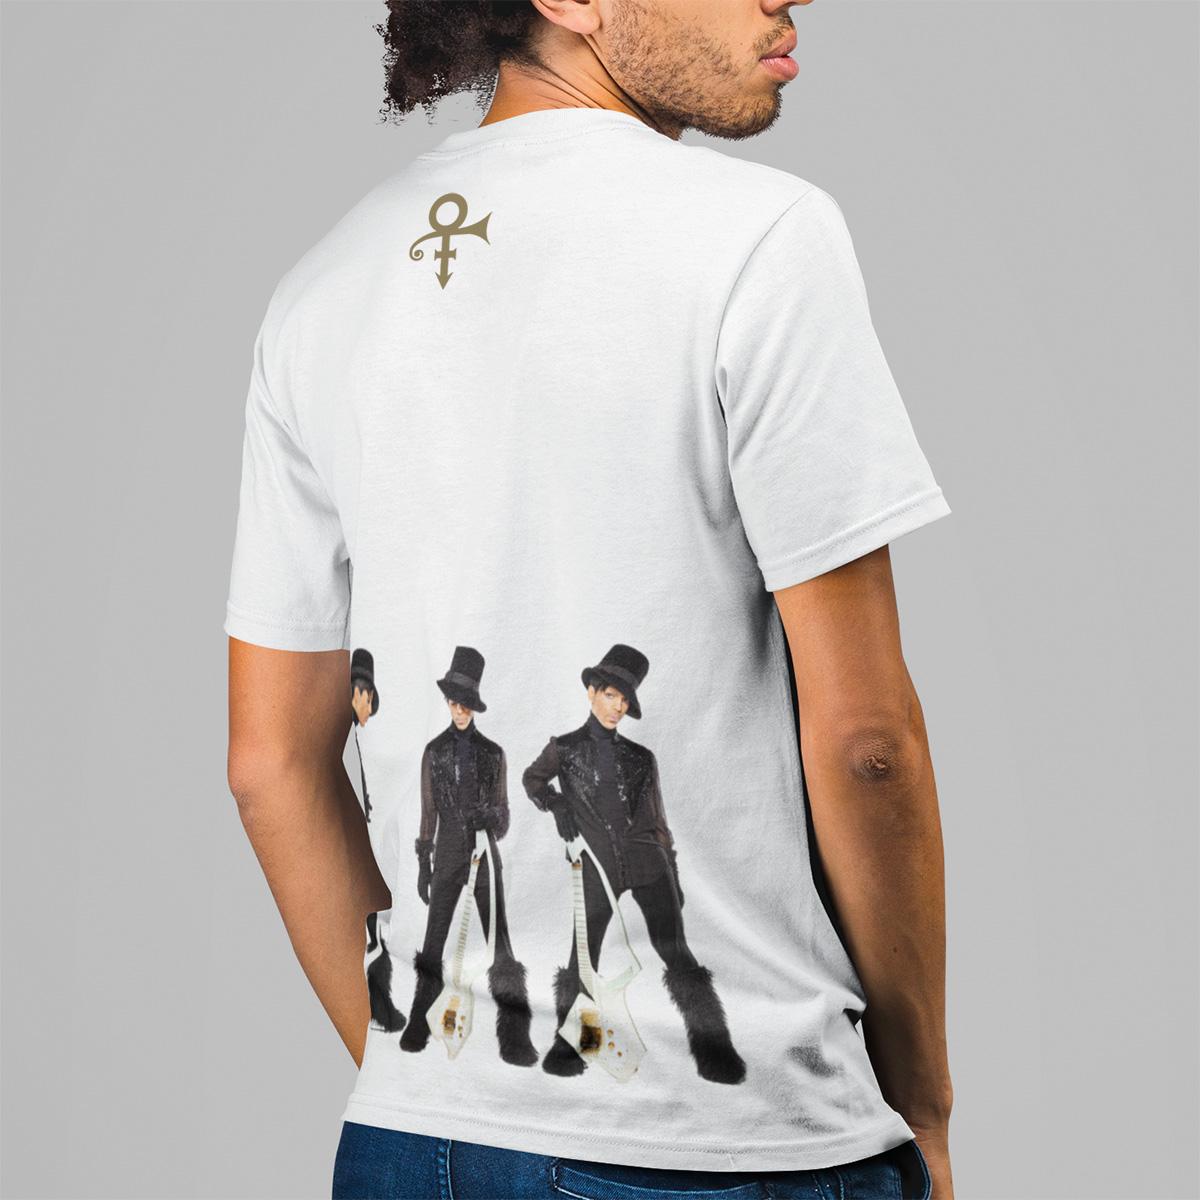 Welcome 2 America Wraparound T-shirt